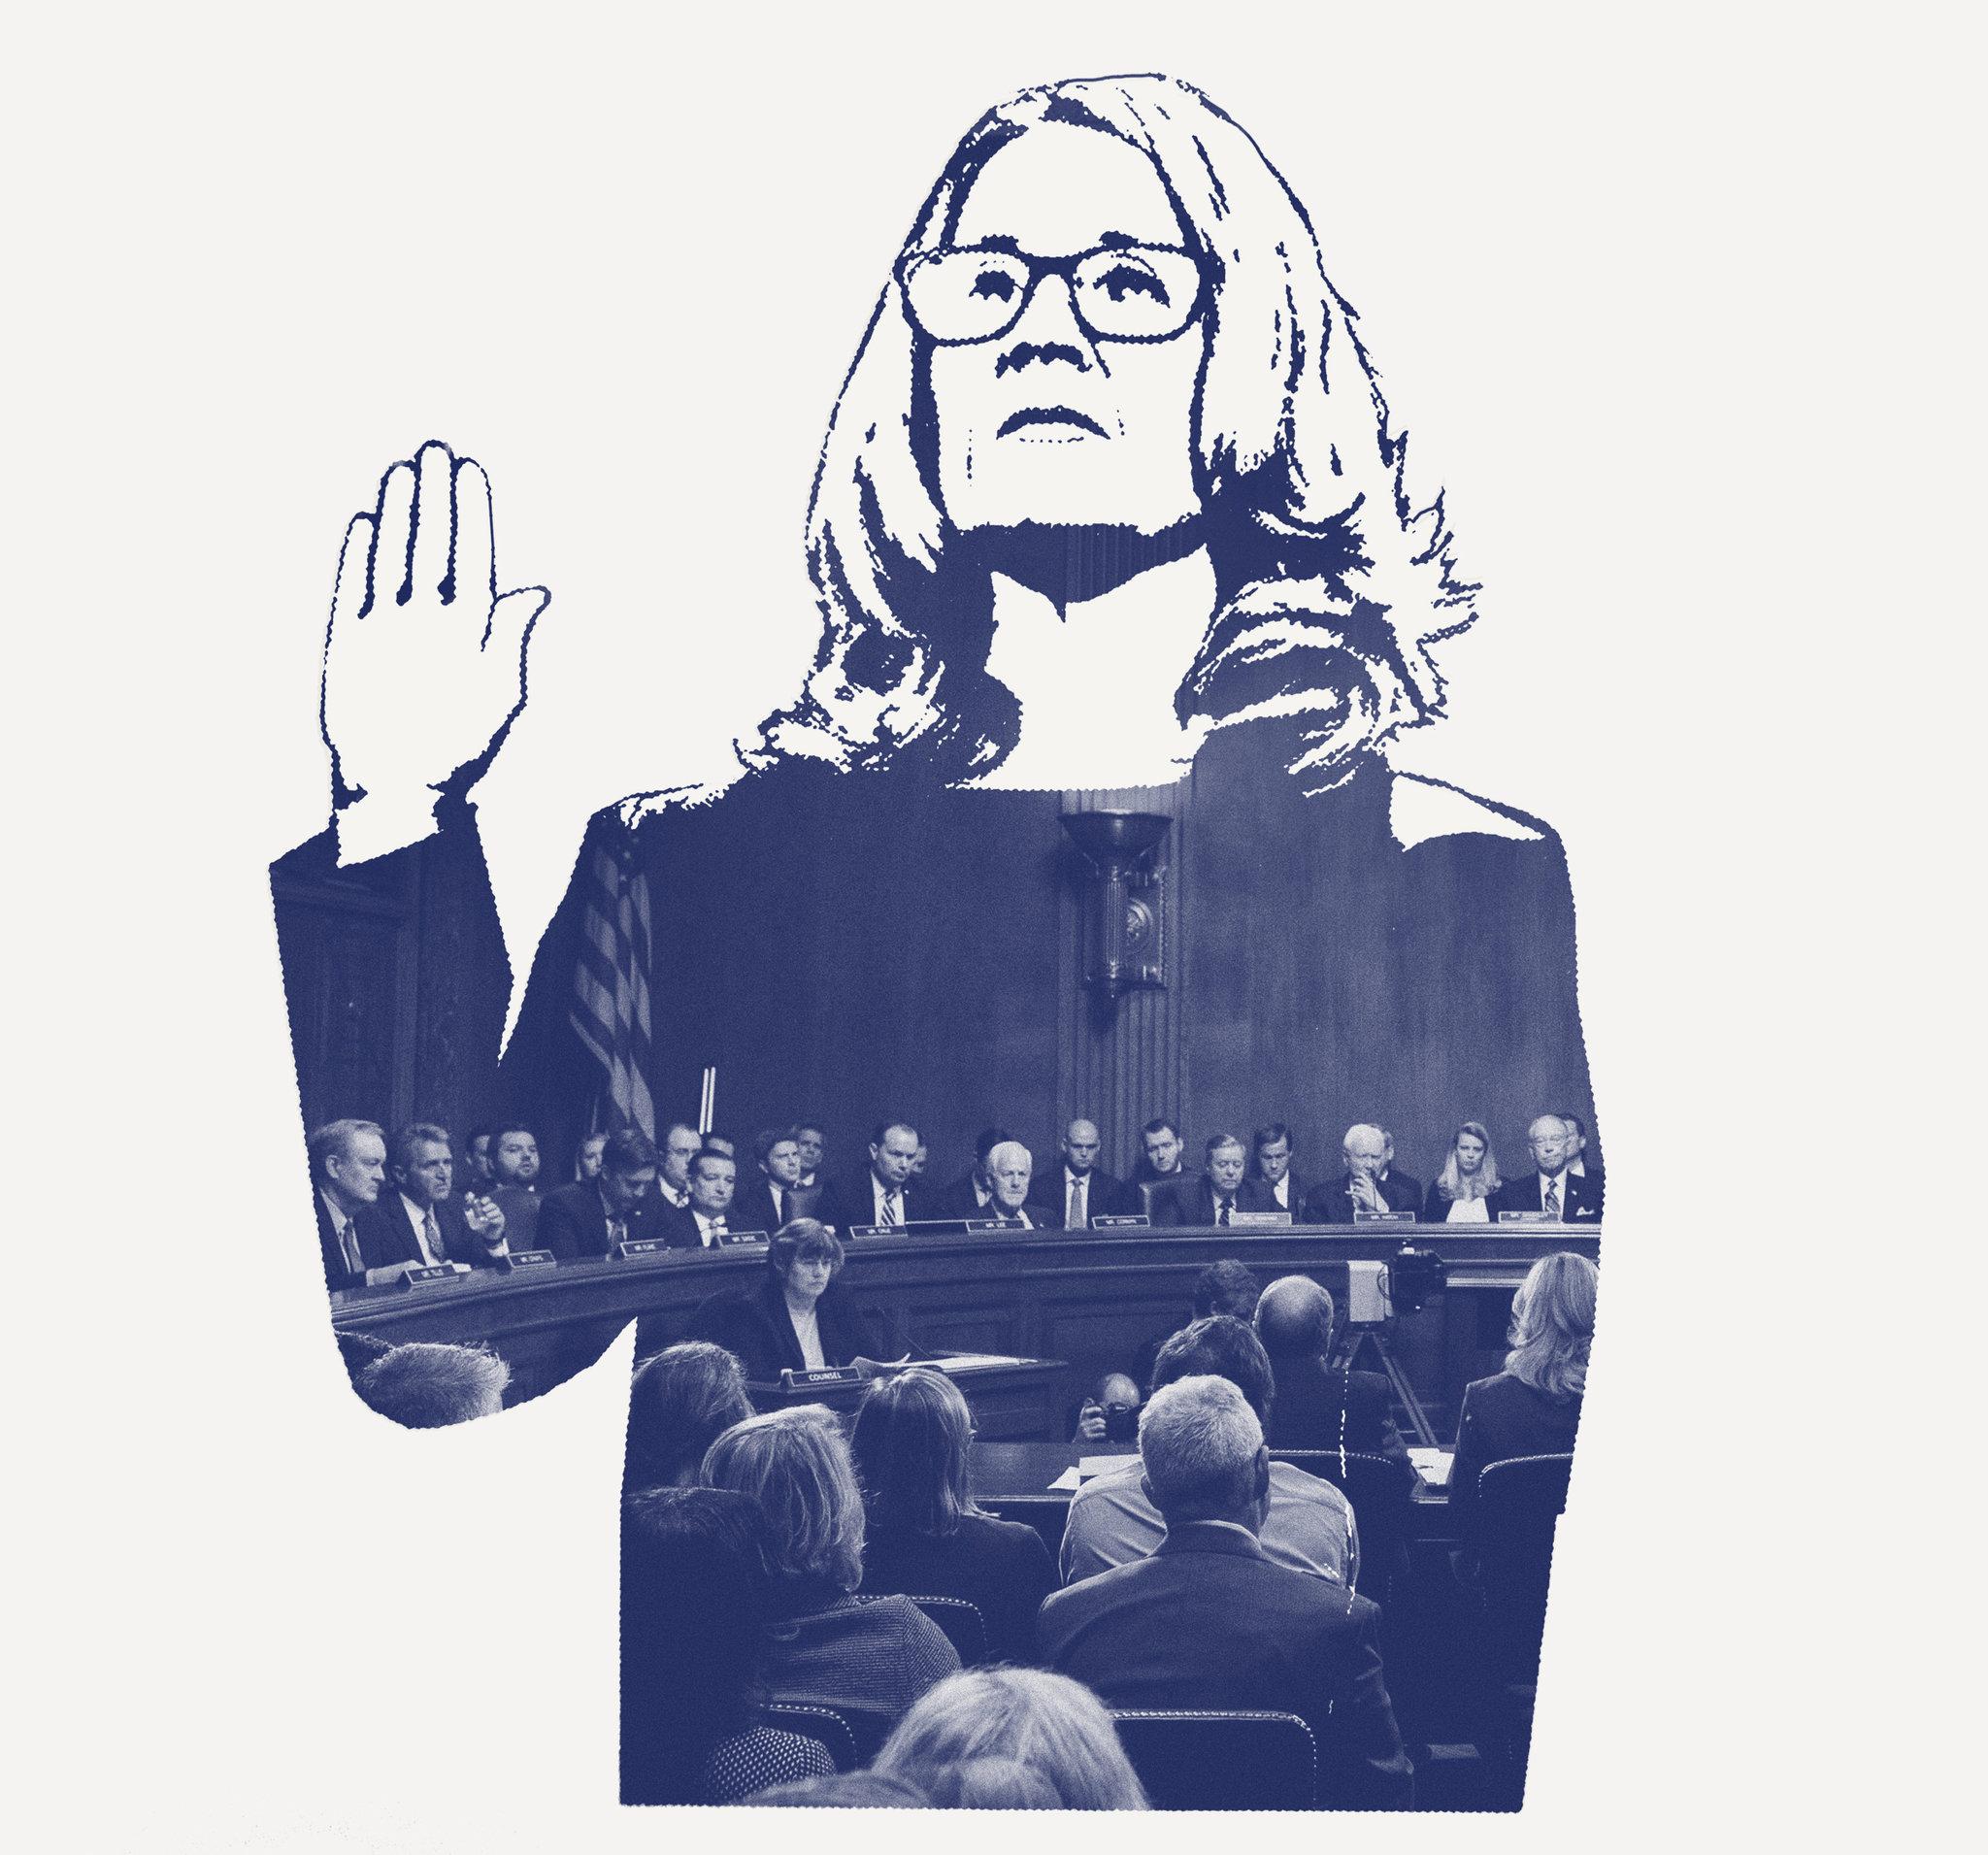 Christine Blasey Ford's Sacrifice